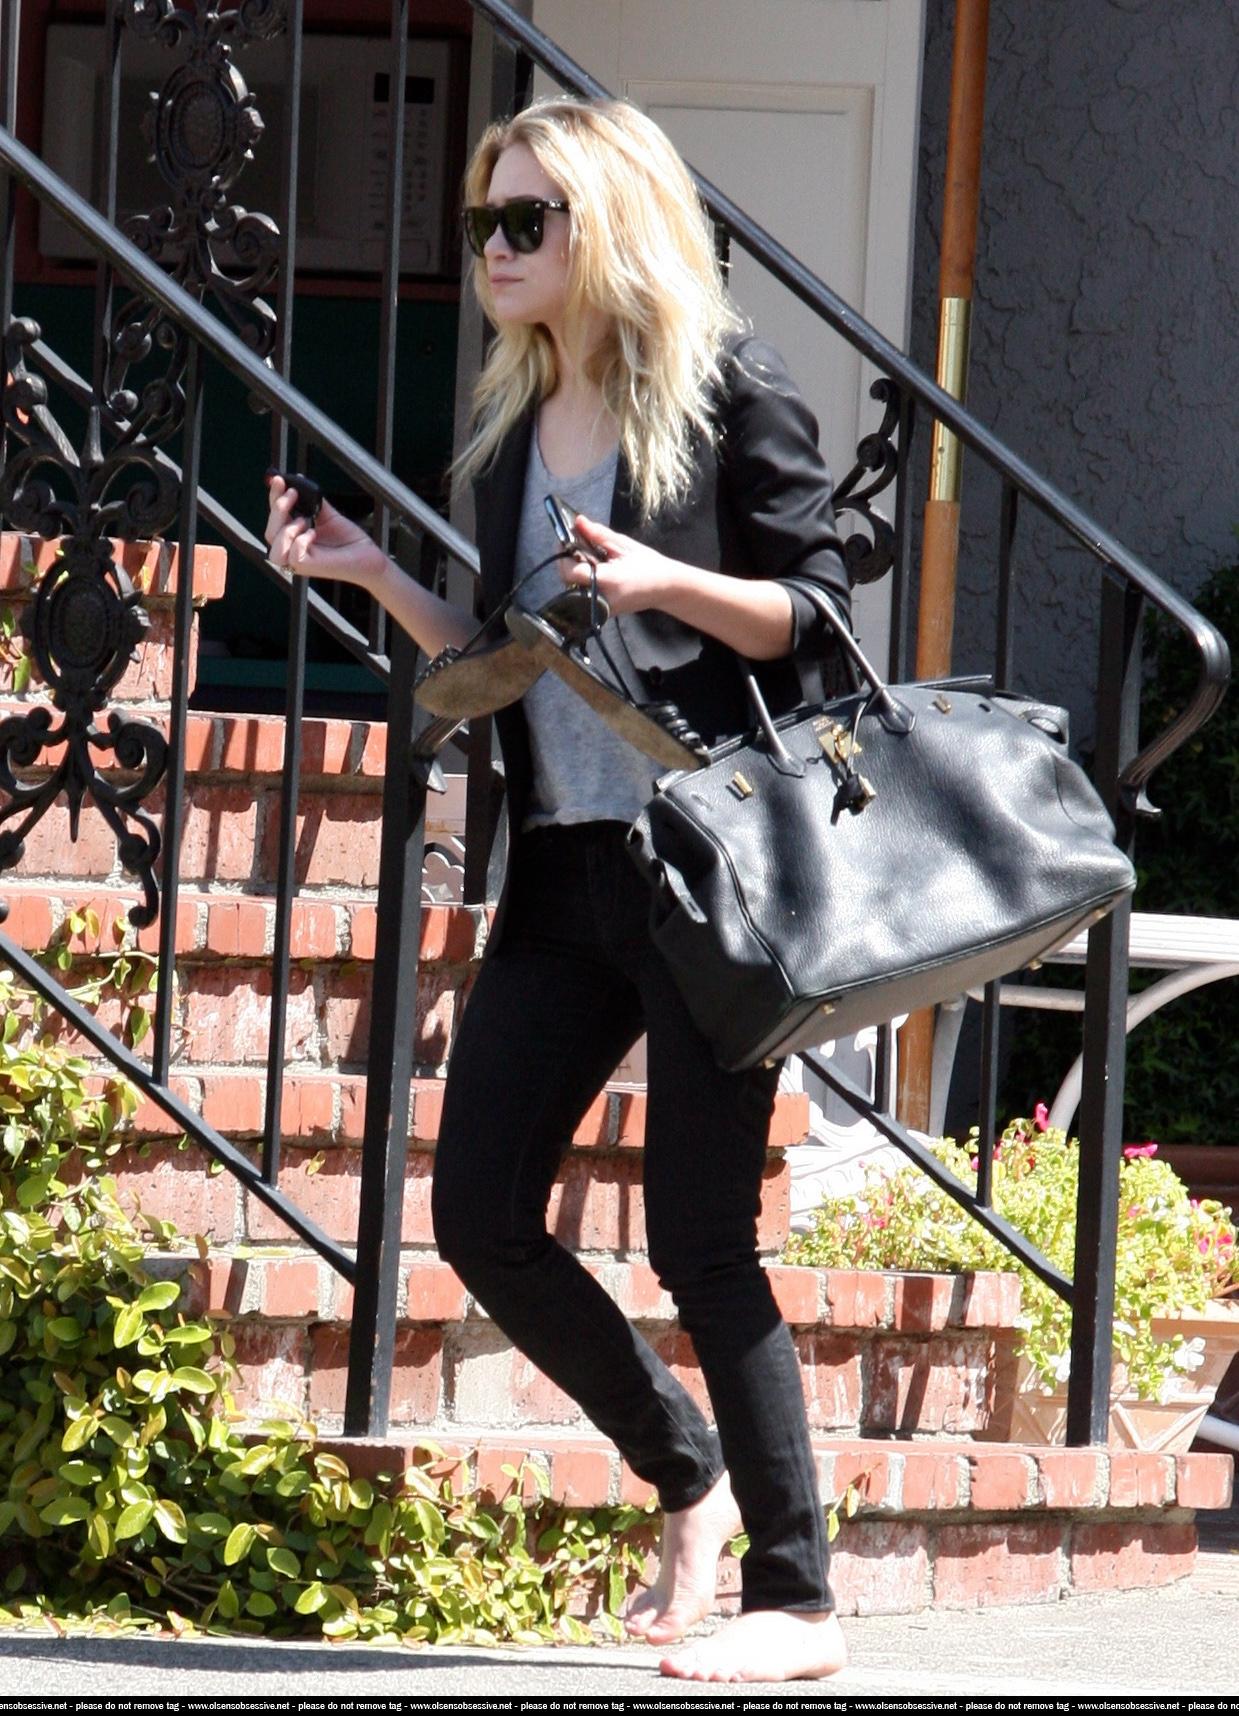 https://pics.wikifeet.com/Ashley-Olsen-Feet-548656.jpg